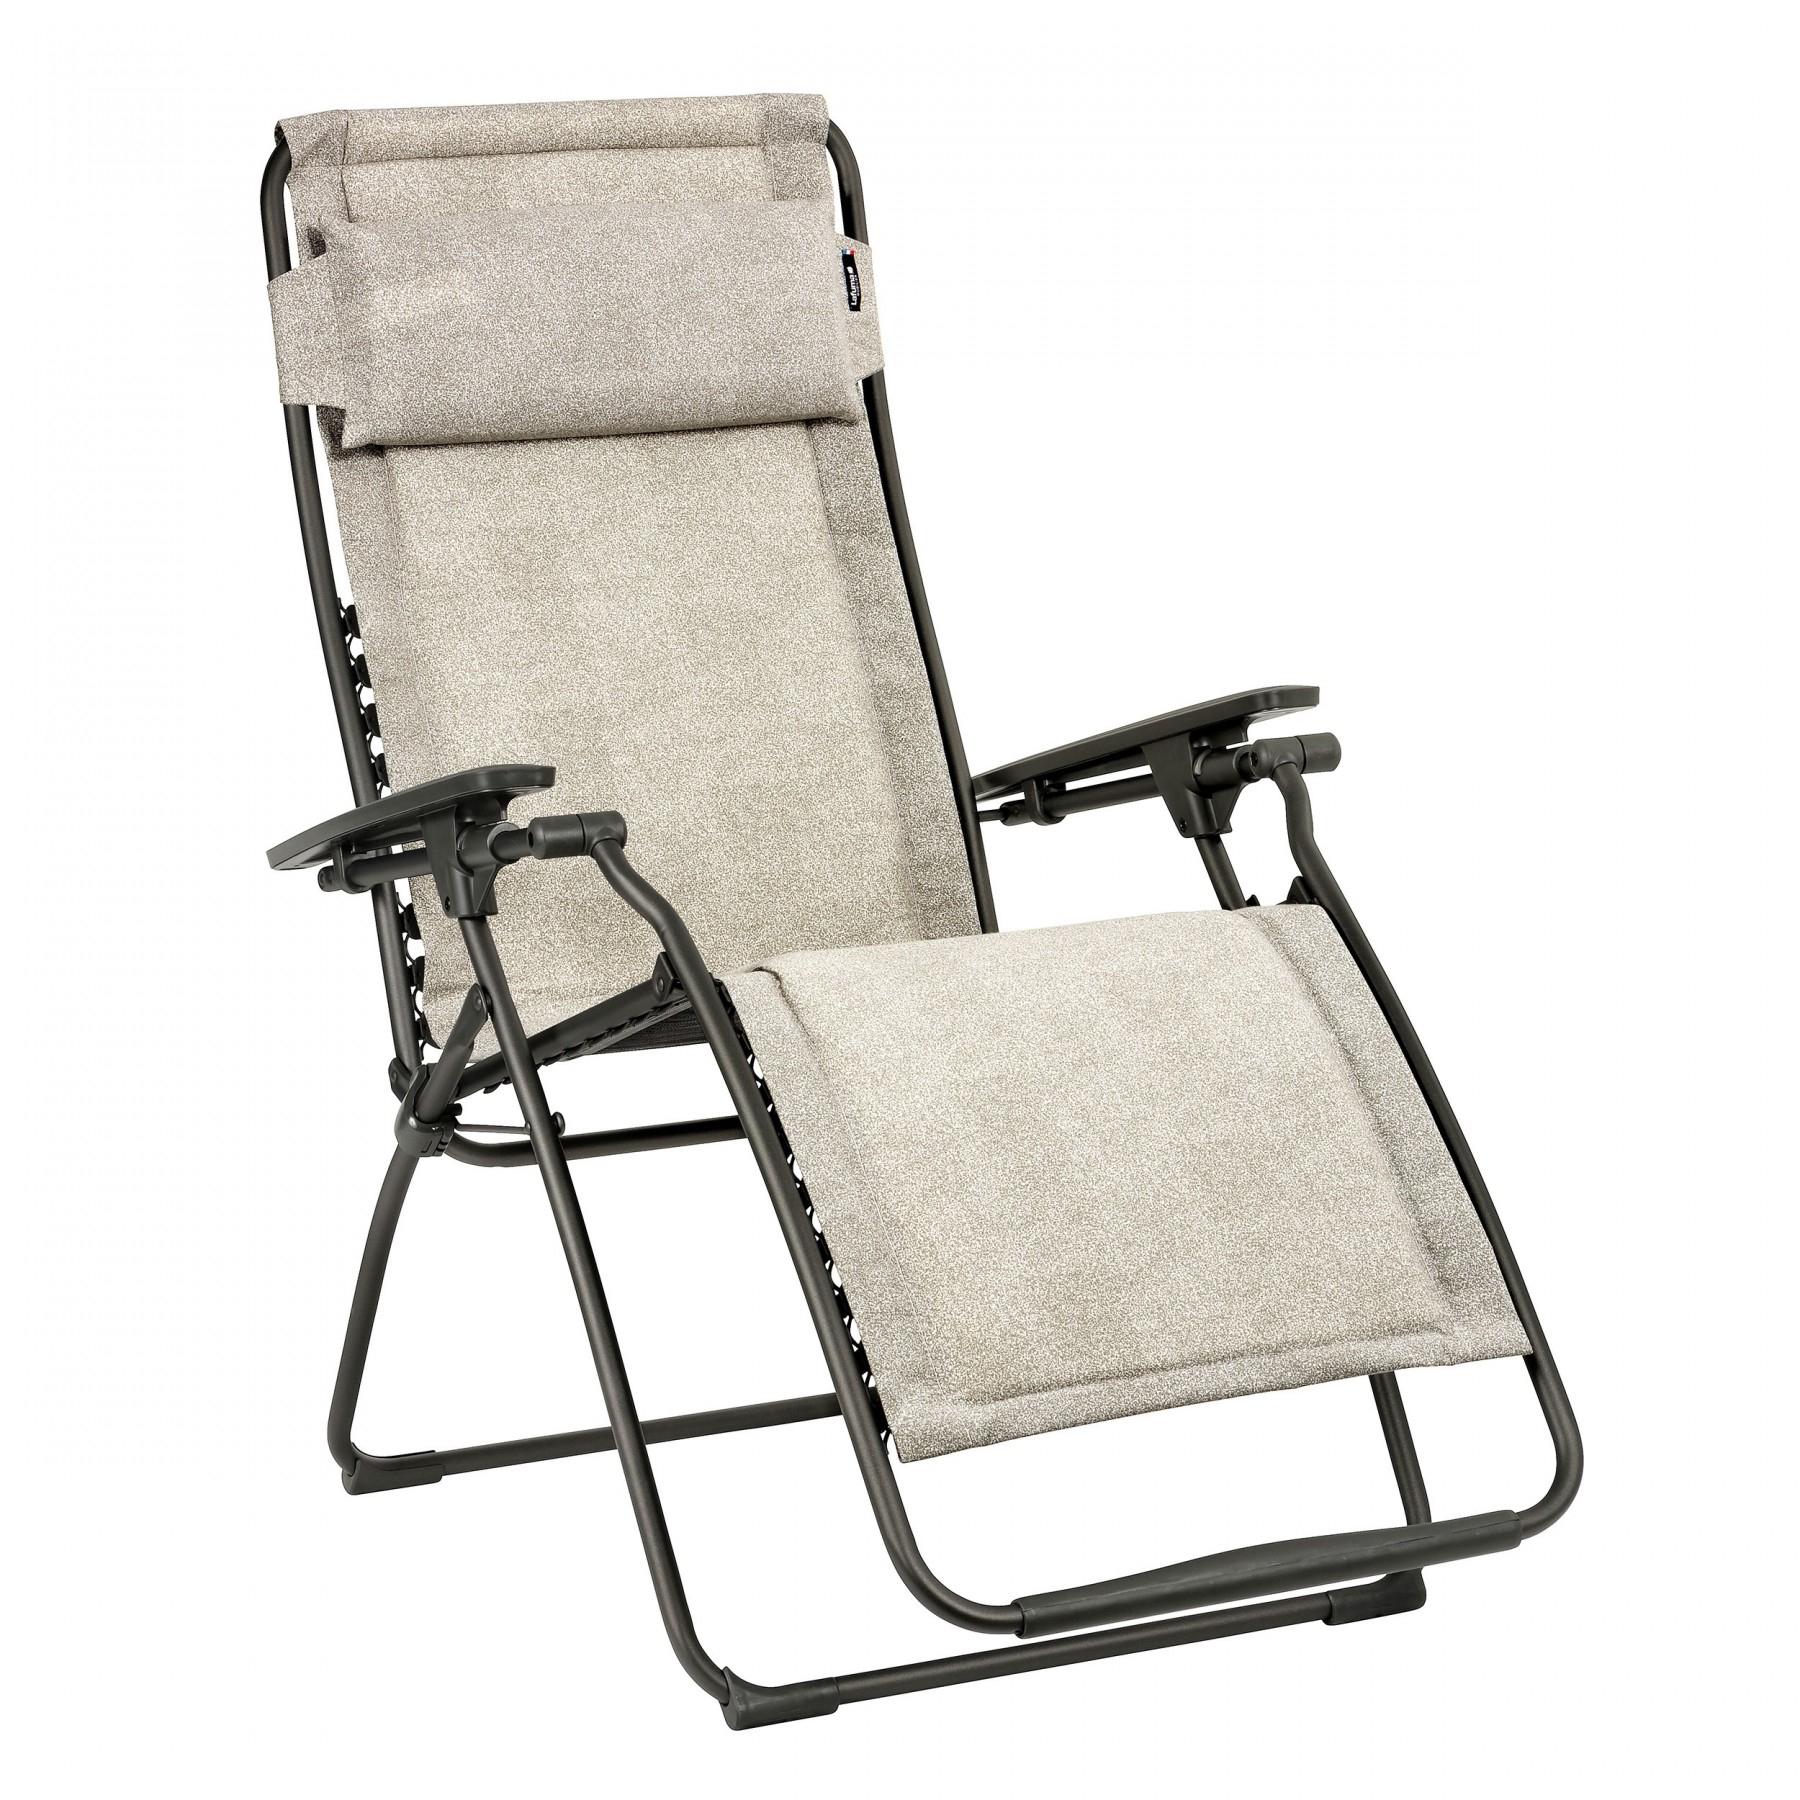 Relaxation Chair Futura Polycotton Chanvre   Lafuma Mobilier tout Relax Lafuma